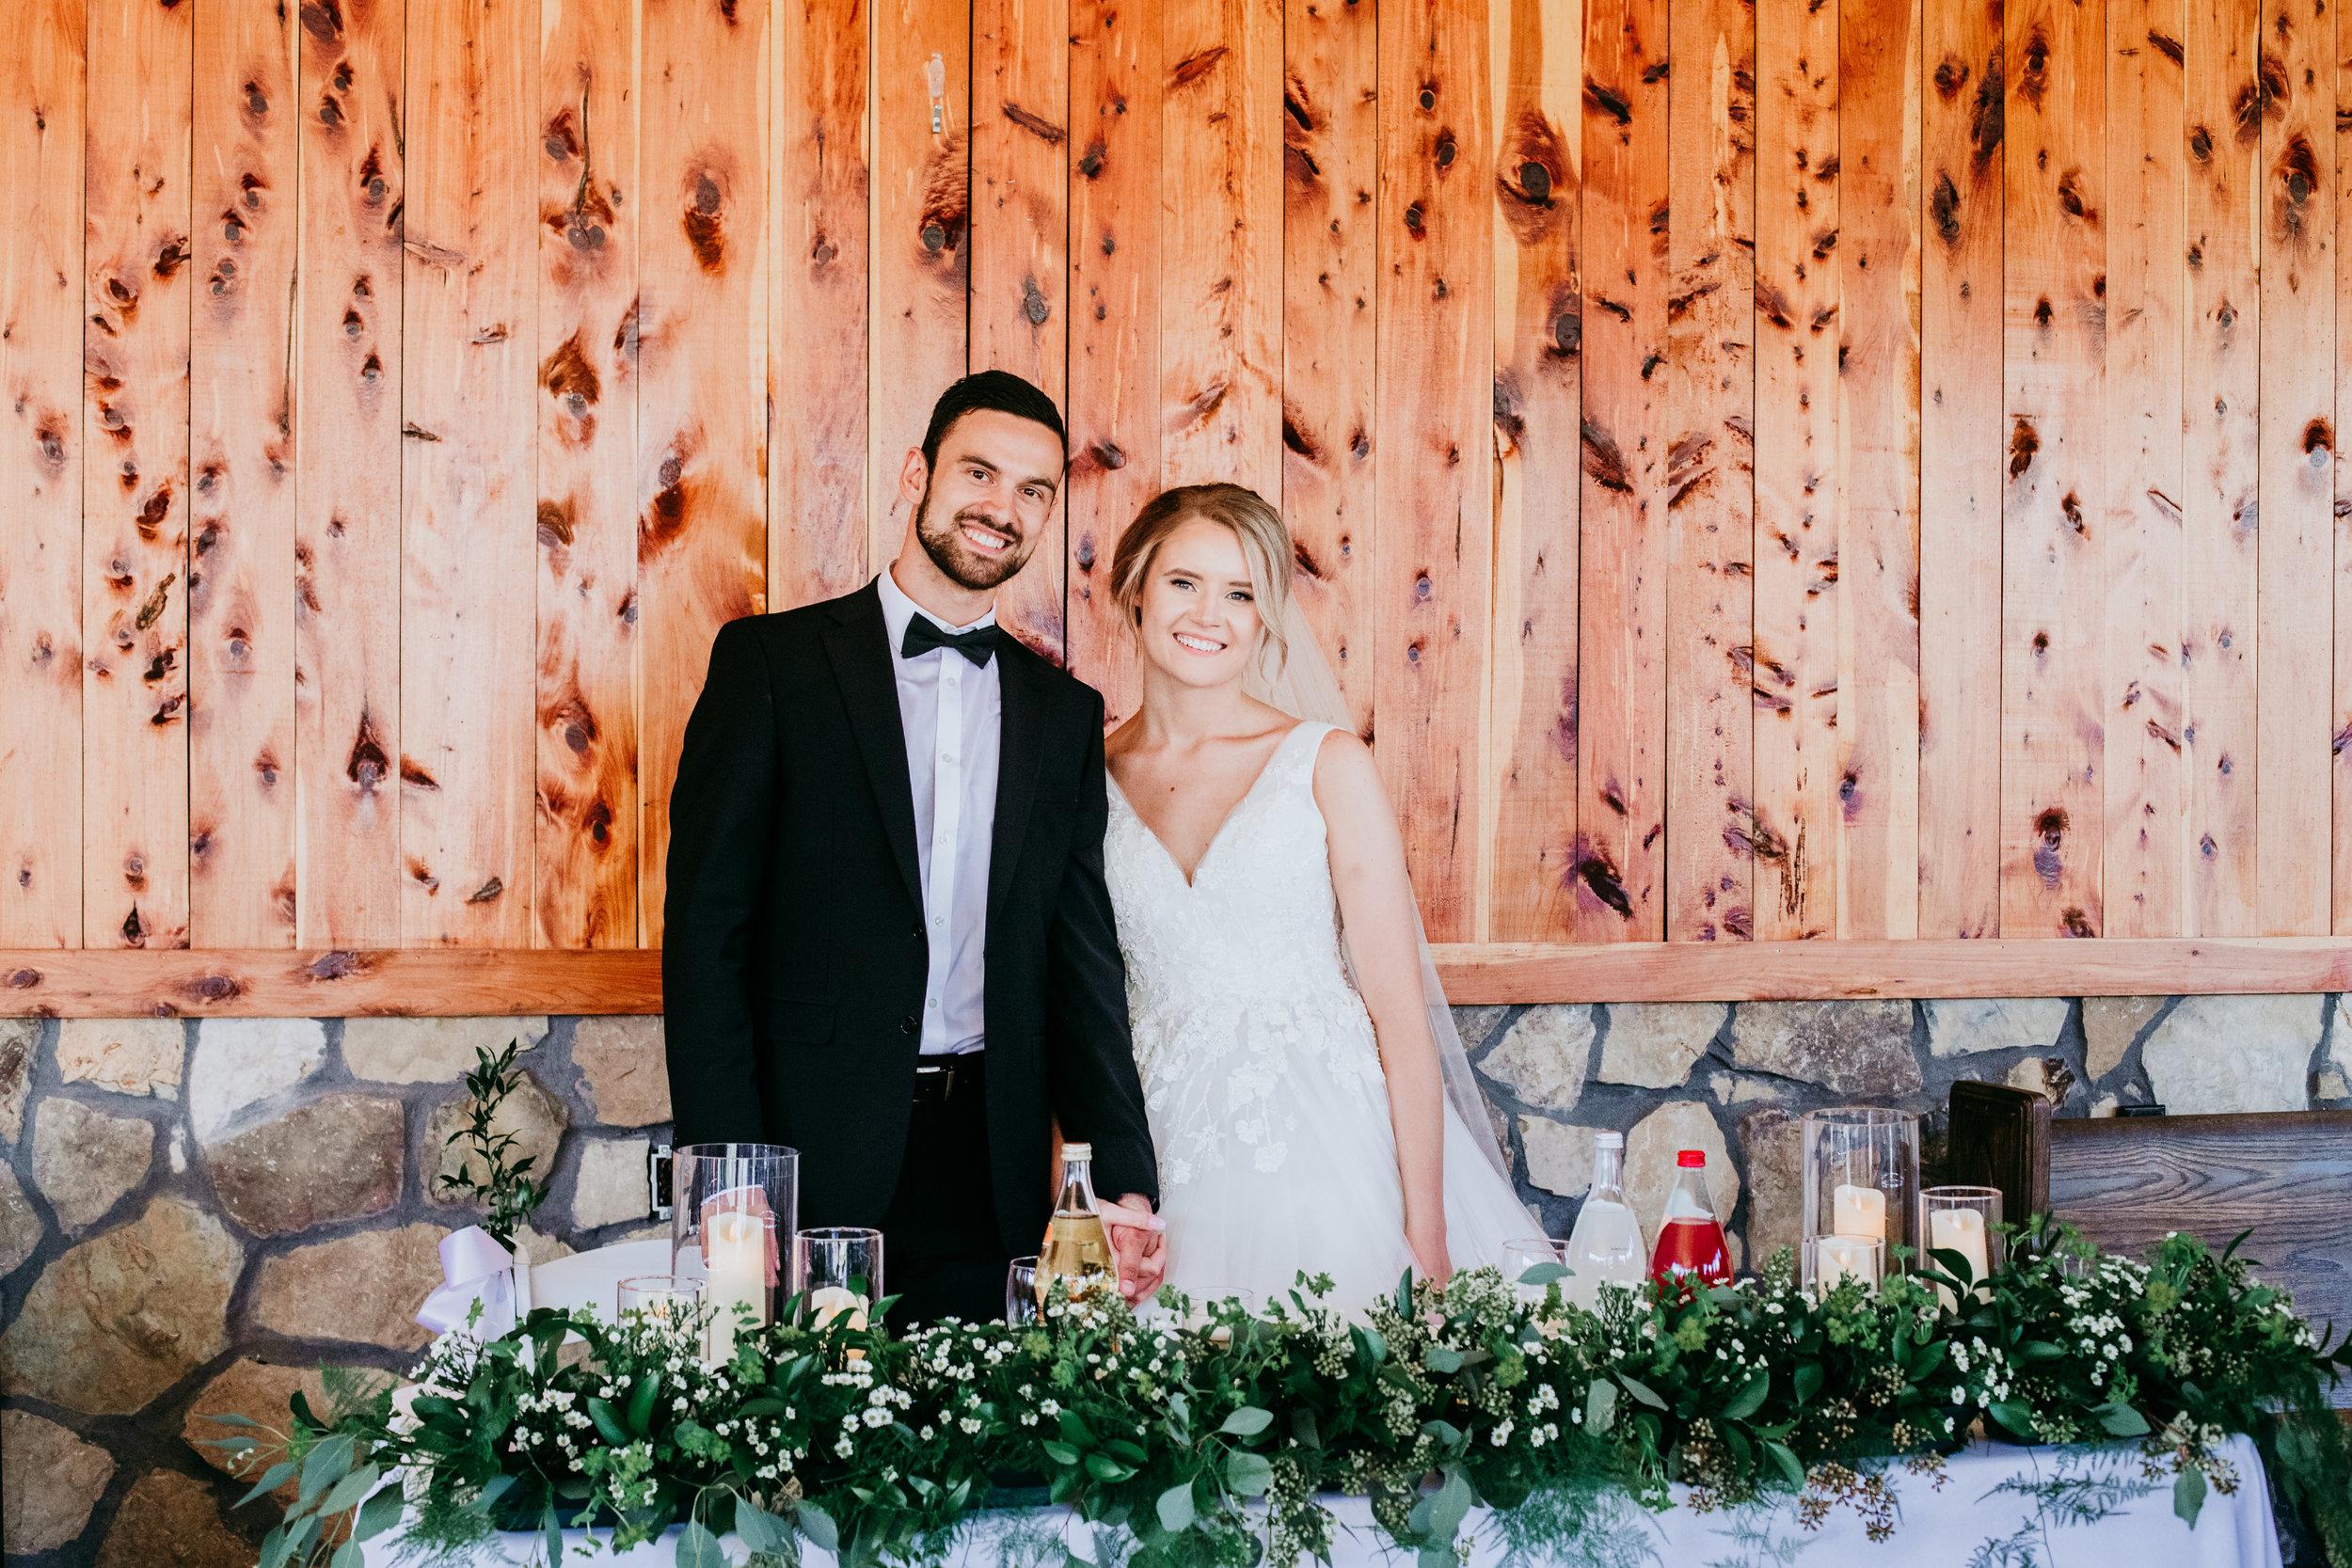 outdoor-wedding-reception-ideas.jpg